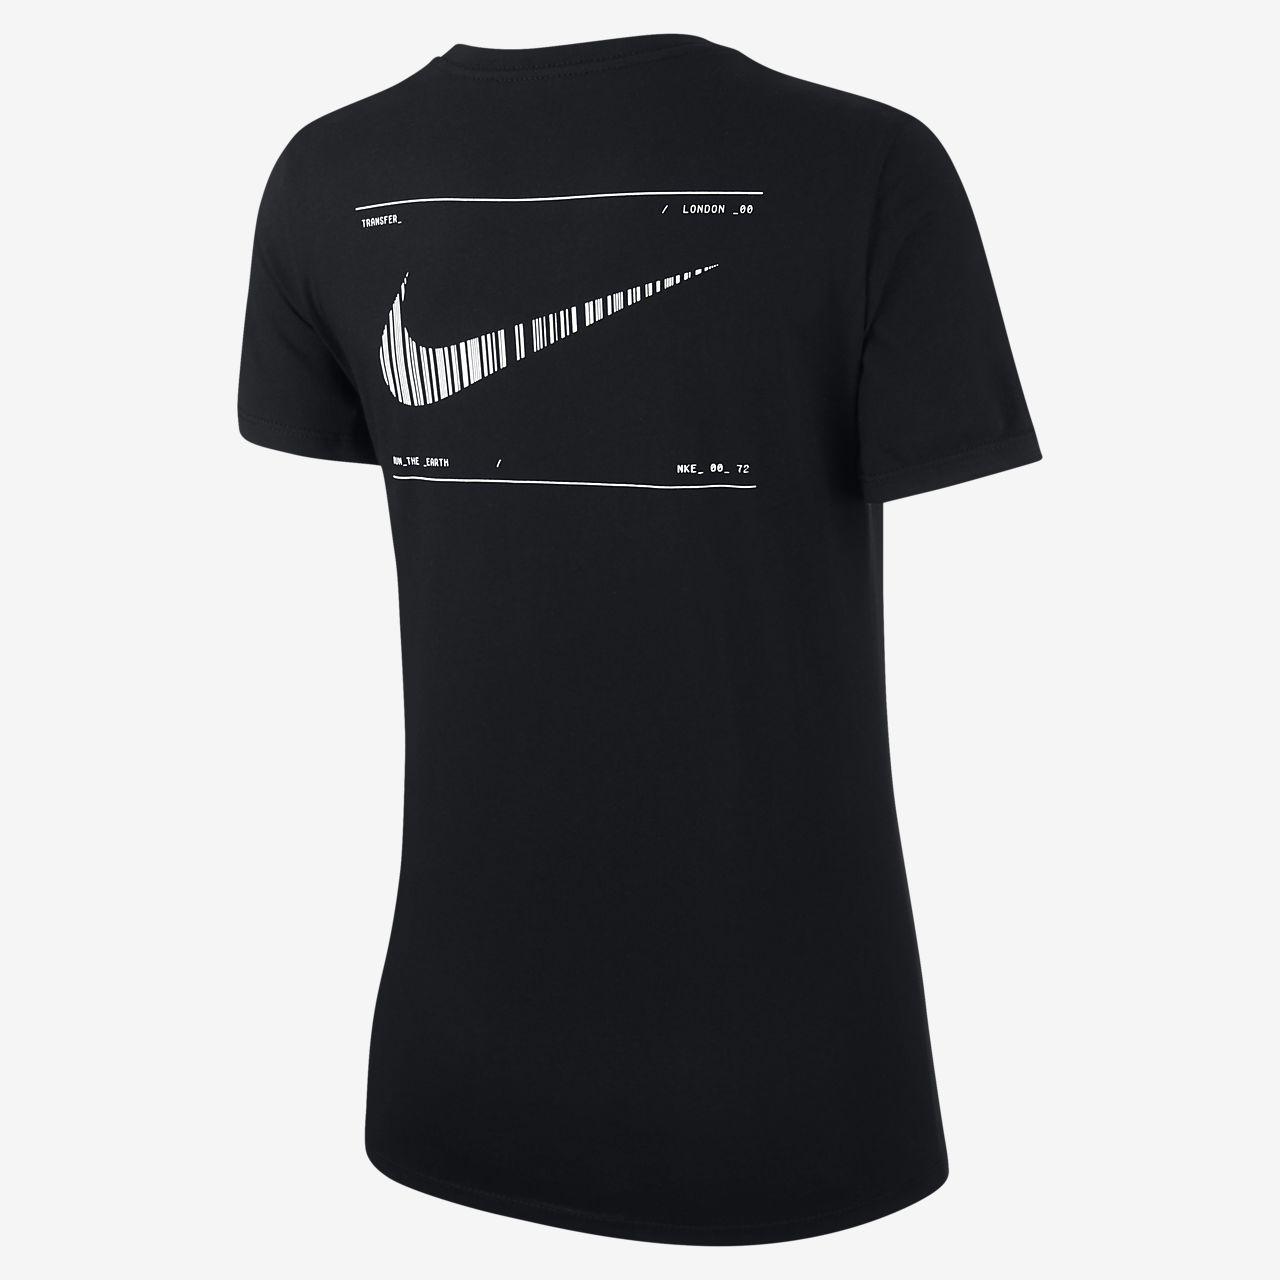 8386e42c Nike Dri-FIT (London) Women's Running T-Shirt. Nike.com GB